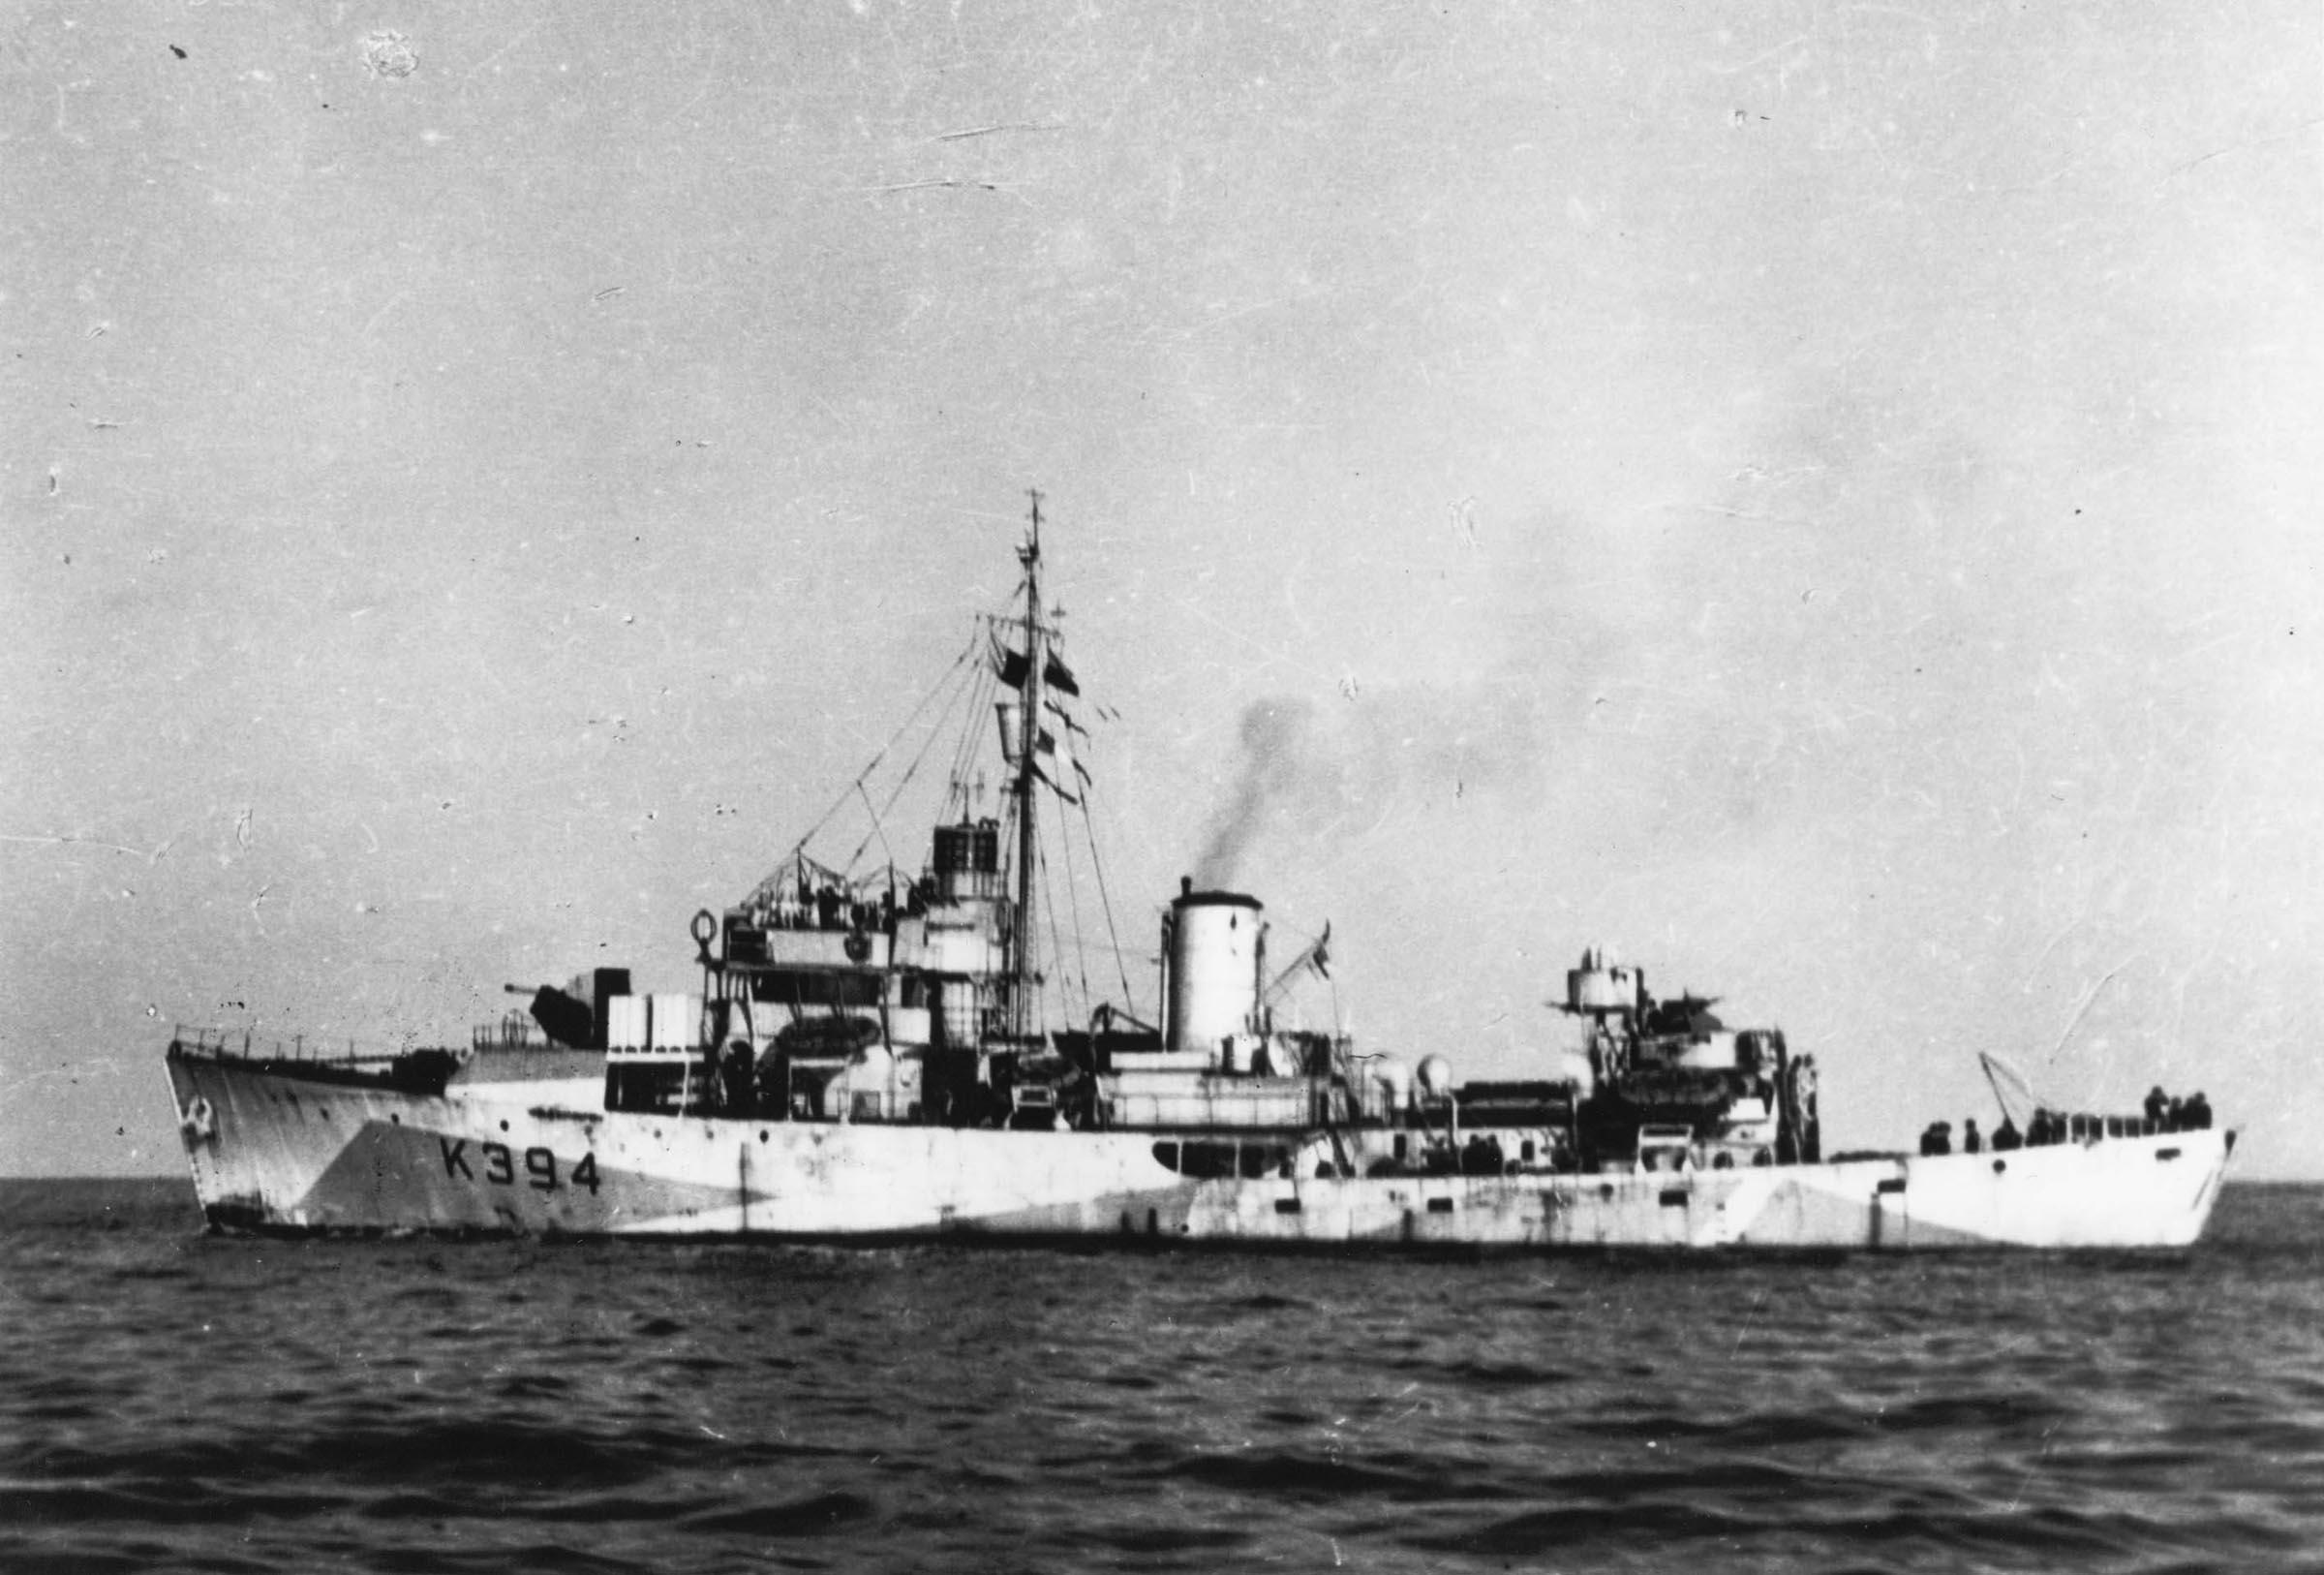 HMCS THORLOCK